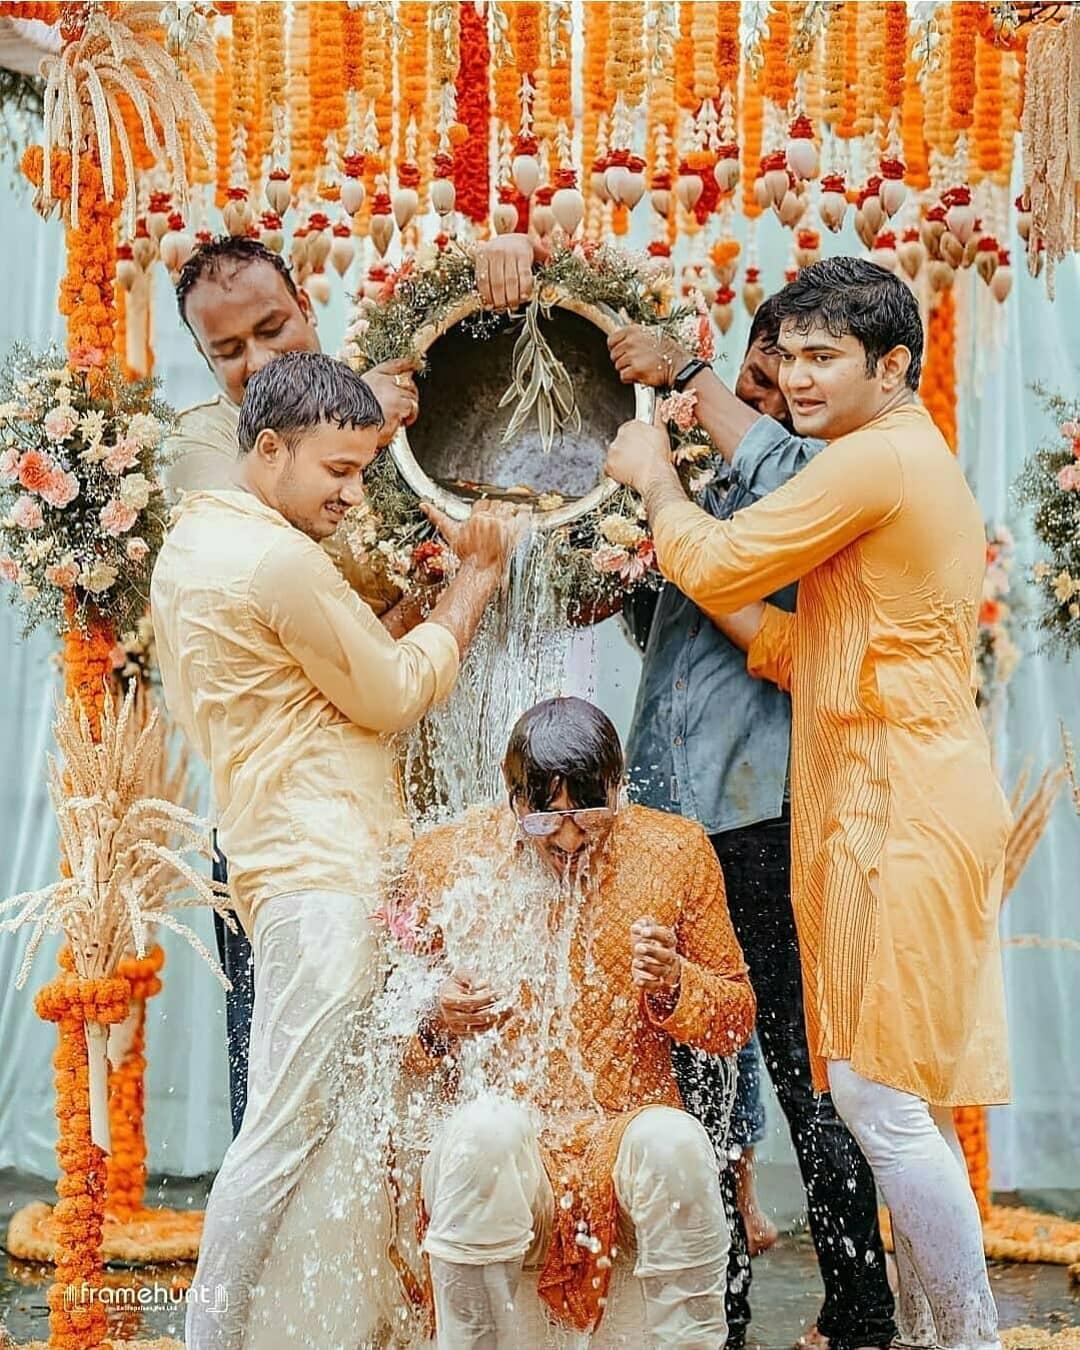 VIP Matrimonial Services in India